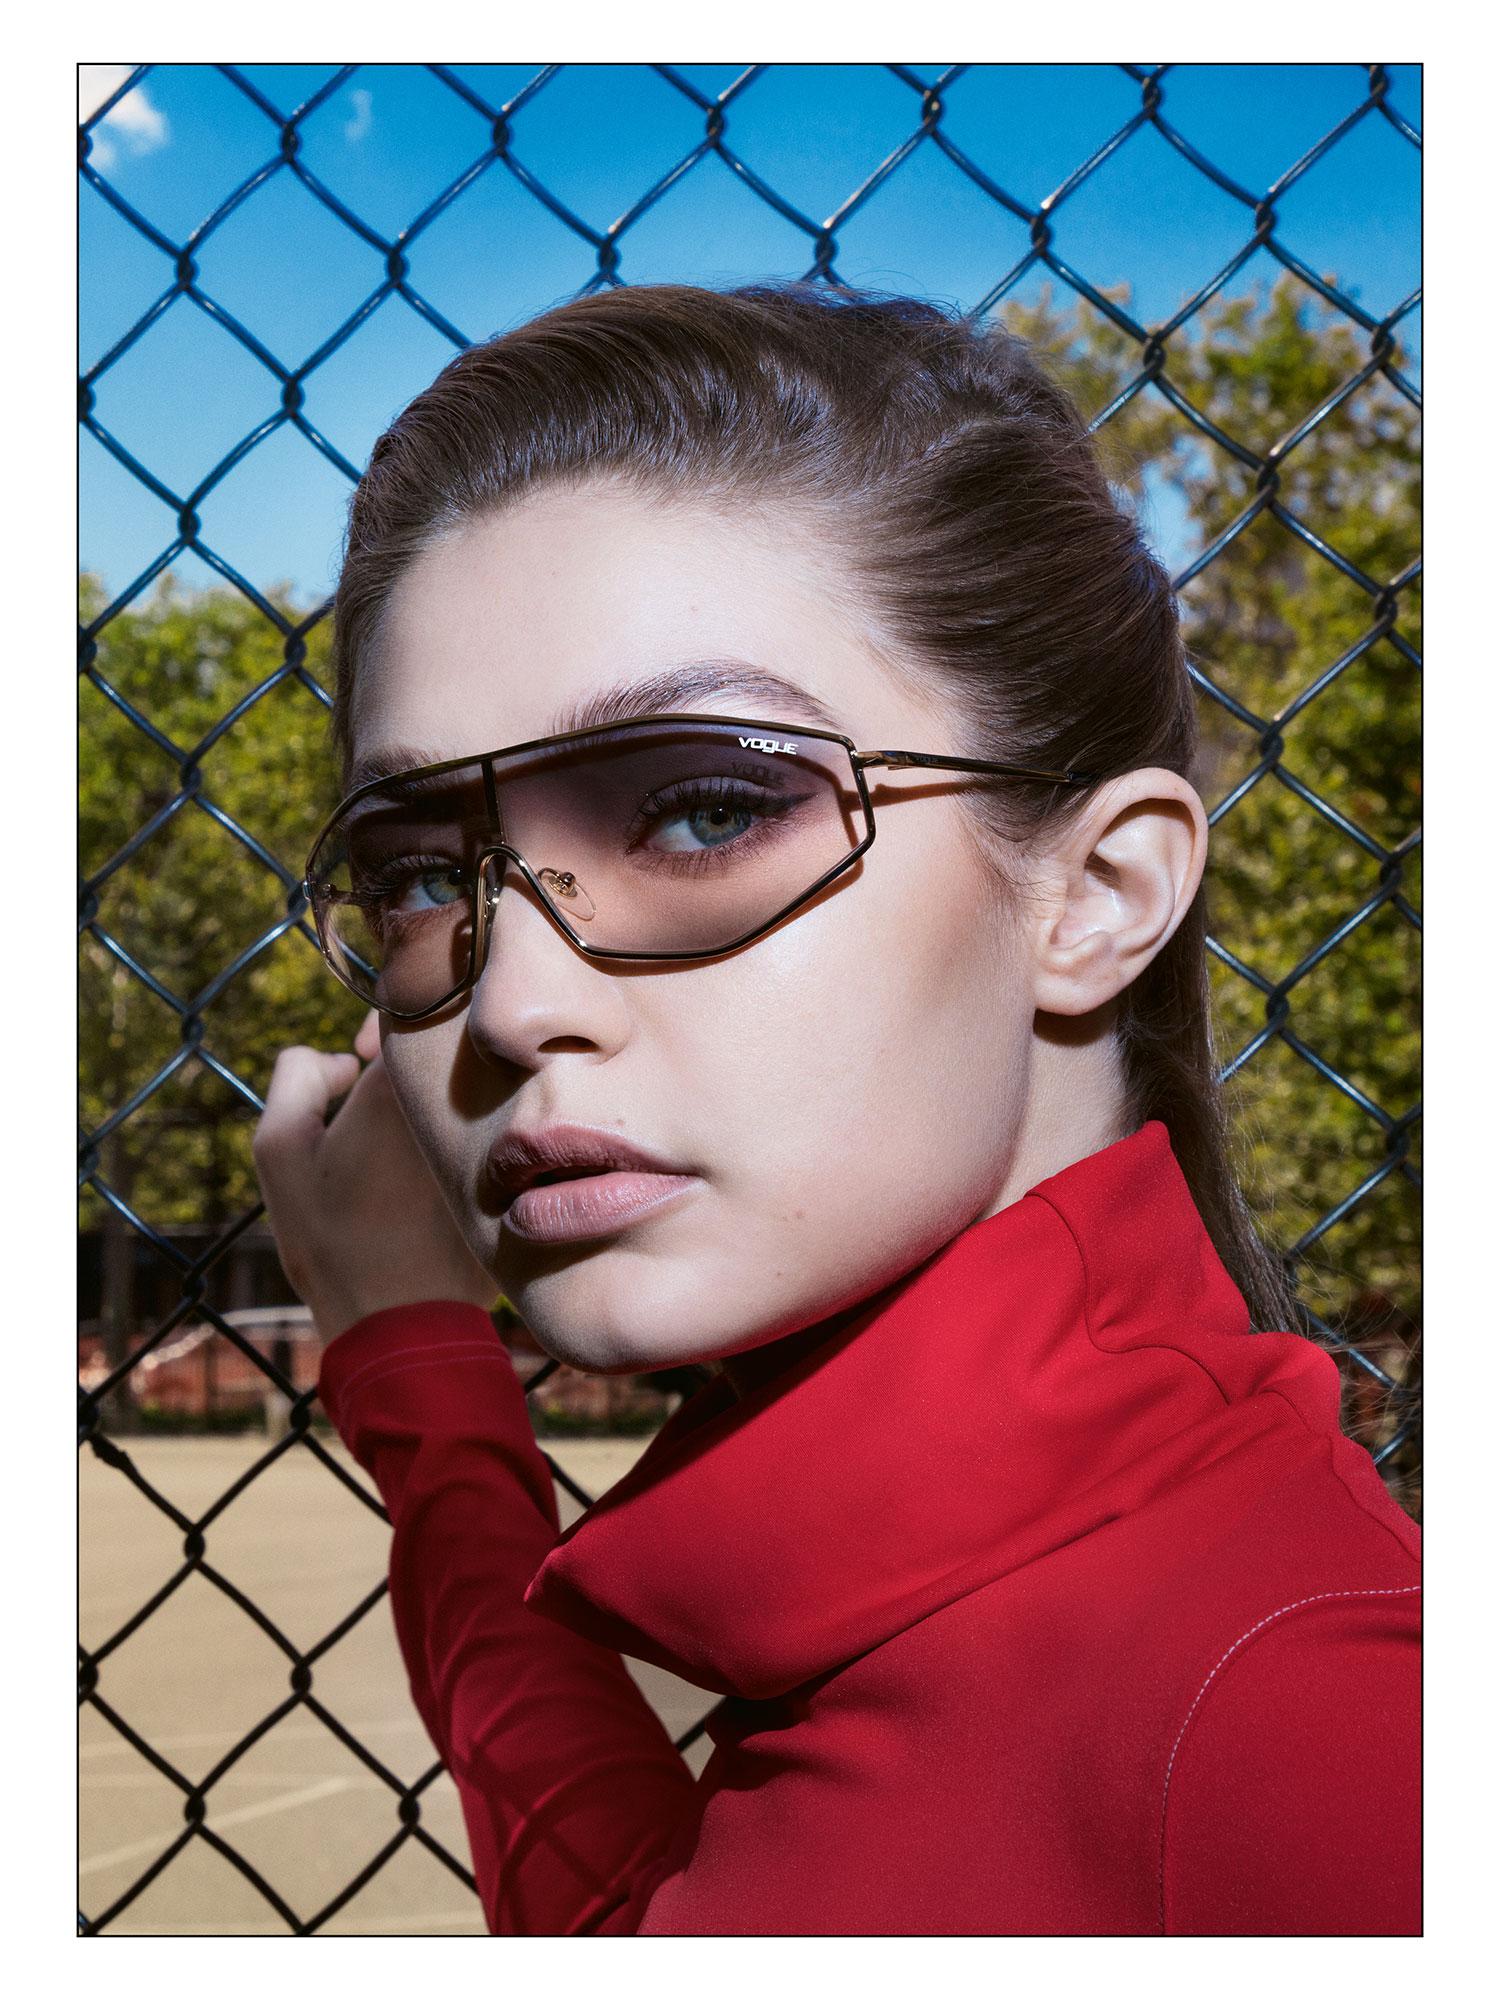 f43cce0d89c3 Gigi Hadid x Vogue Eyewear Spring 2019 Sunglass Campaign  Pics